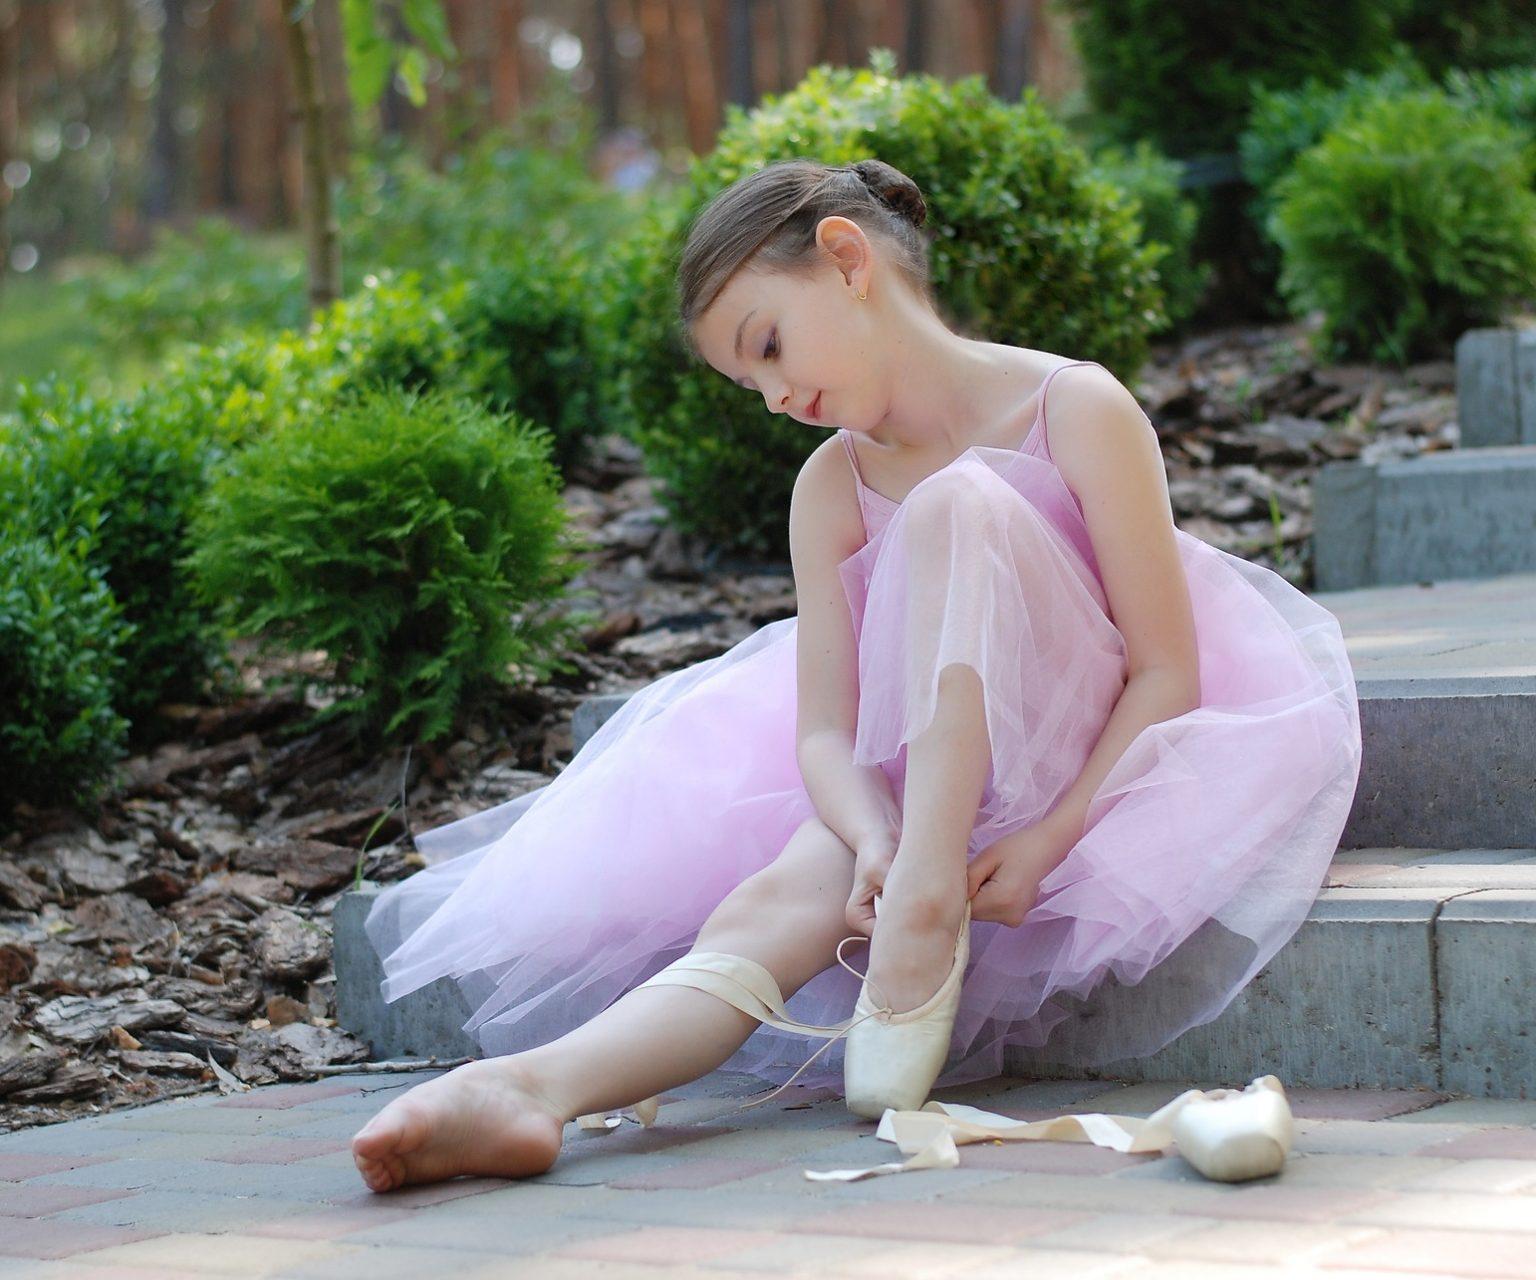 ballet 2789416 1920 oxmrm4ab3e7x2d2ylzl9u2u0xc4j9lryylhr0qitxc - Domov